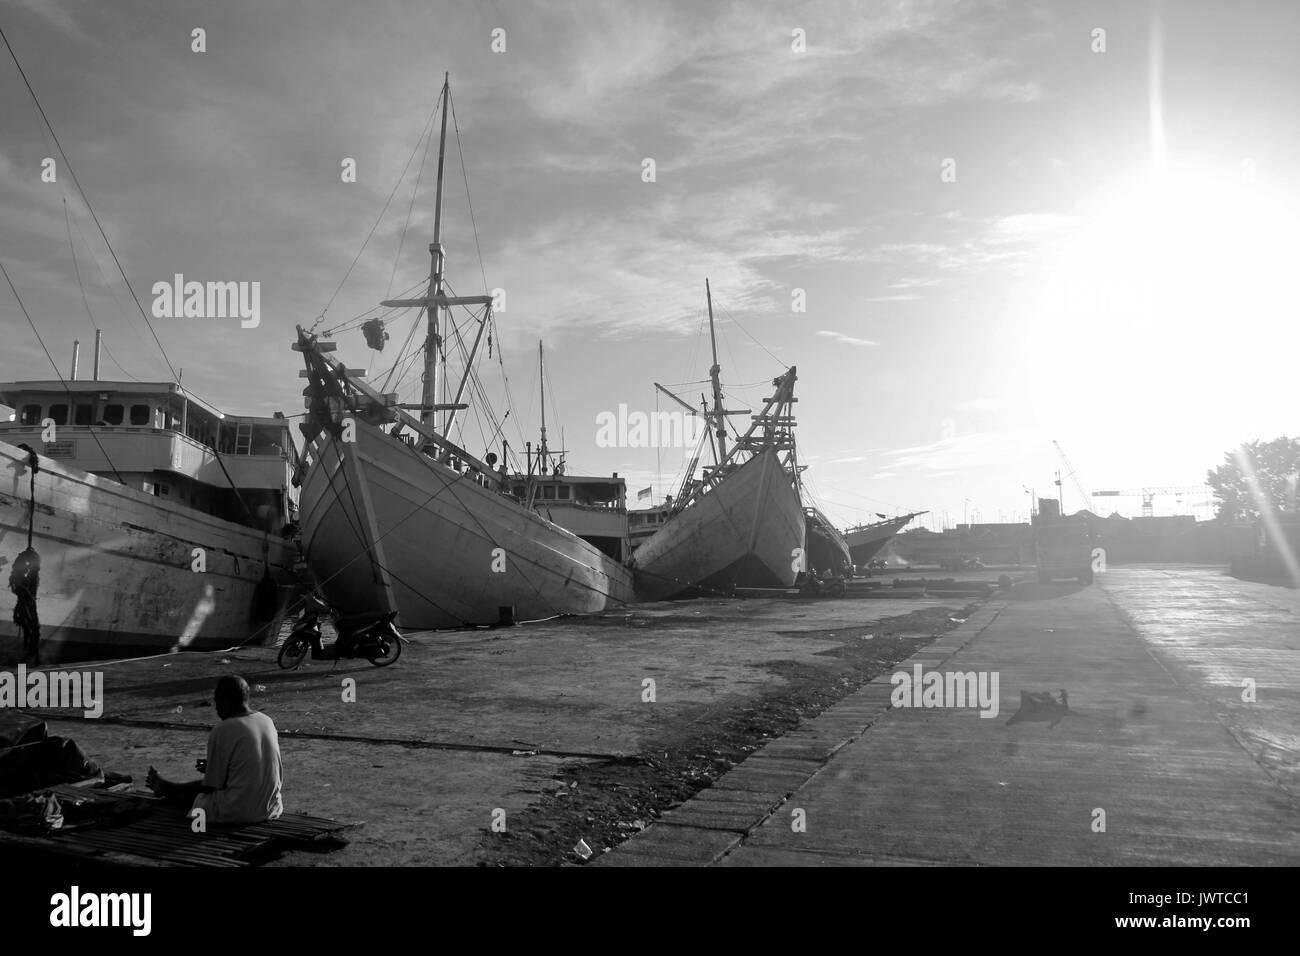 harbor - Stock Image